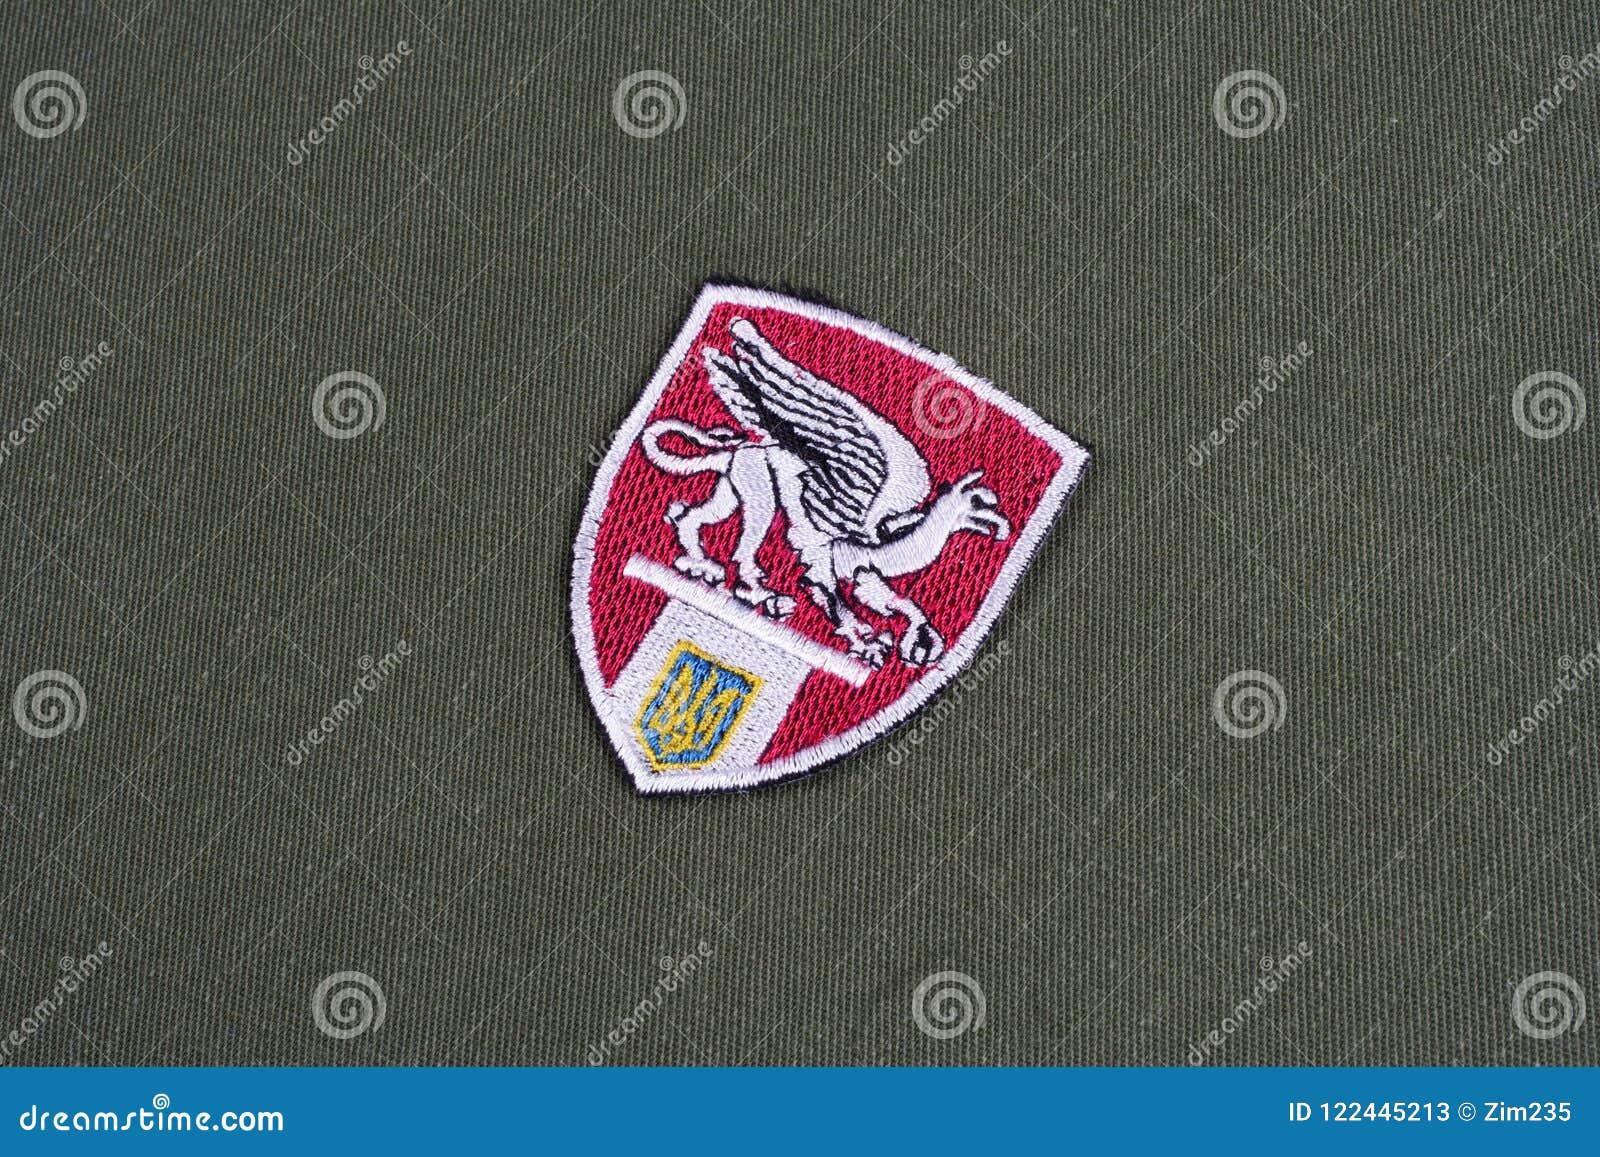 KYIV, UKRAINE - July, 16, 2015. Ministry of Internal Affairs (Ukraine) uniform badge